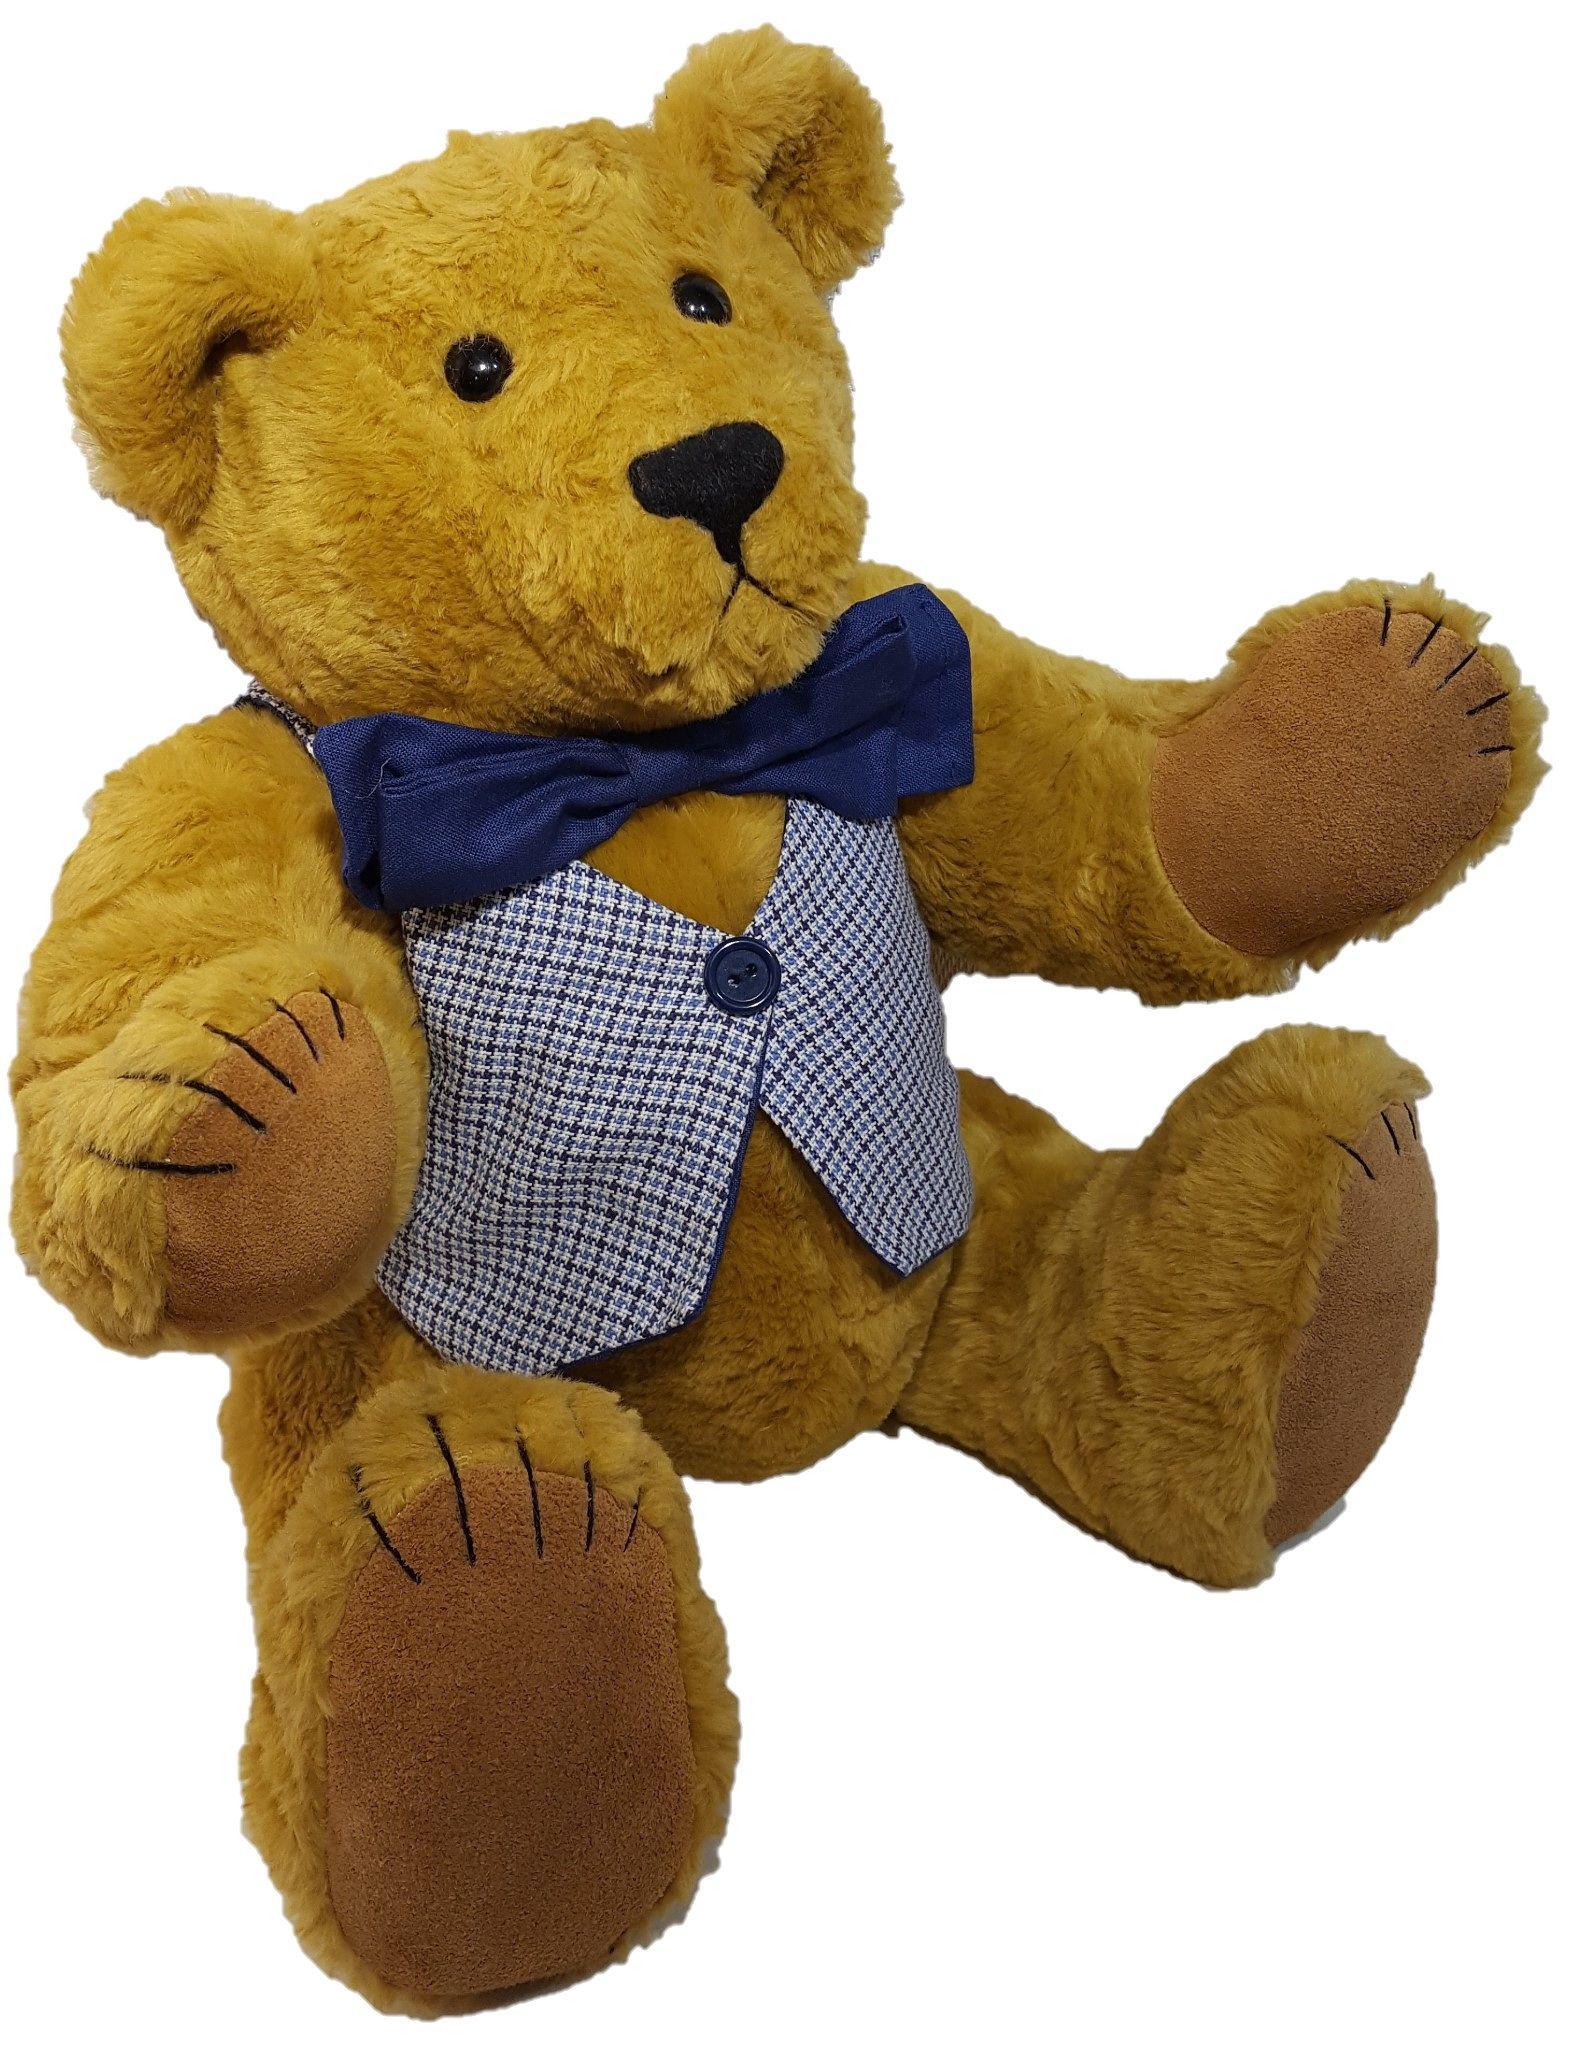 Classic Teddy in blue waistcoat